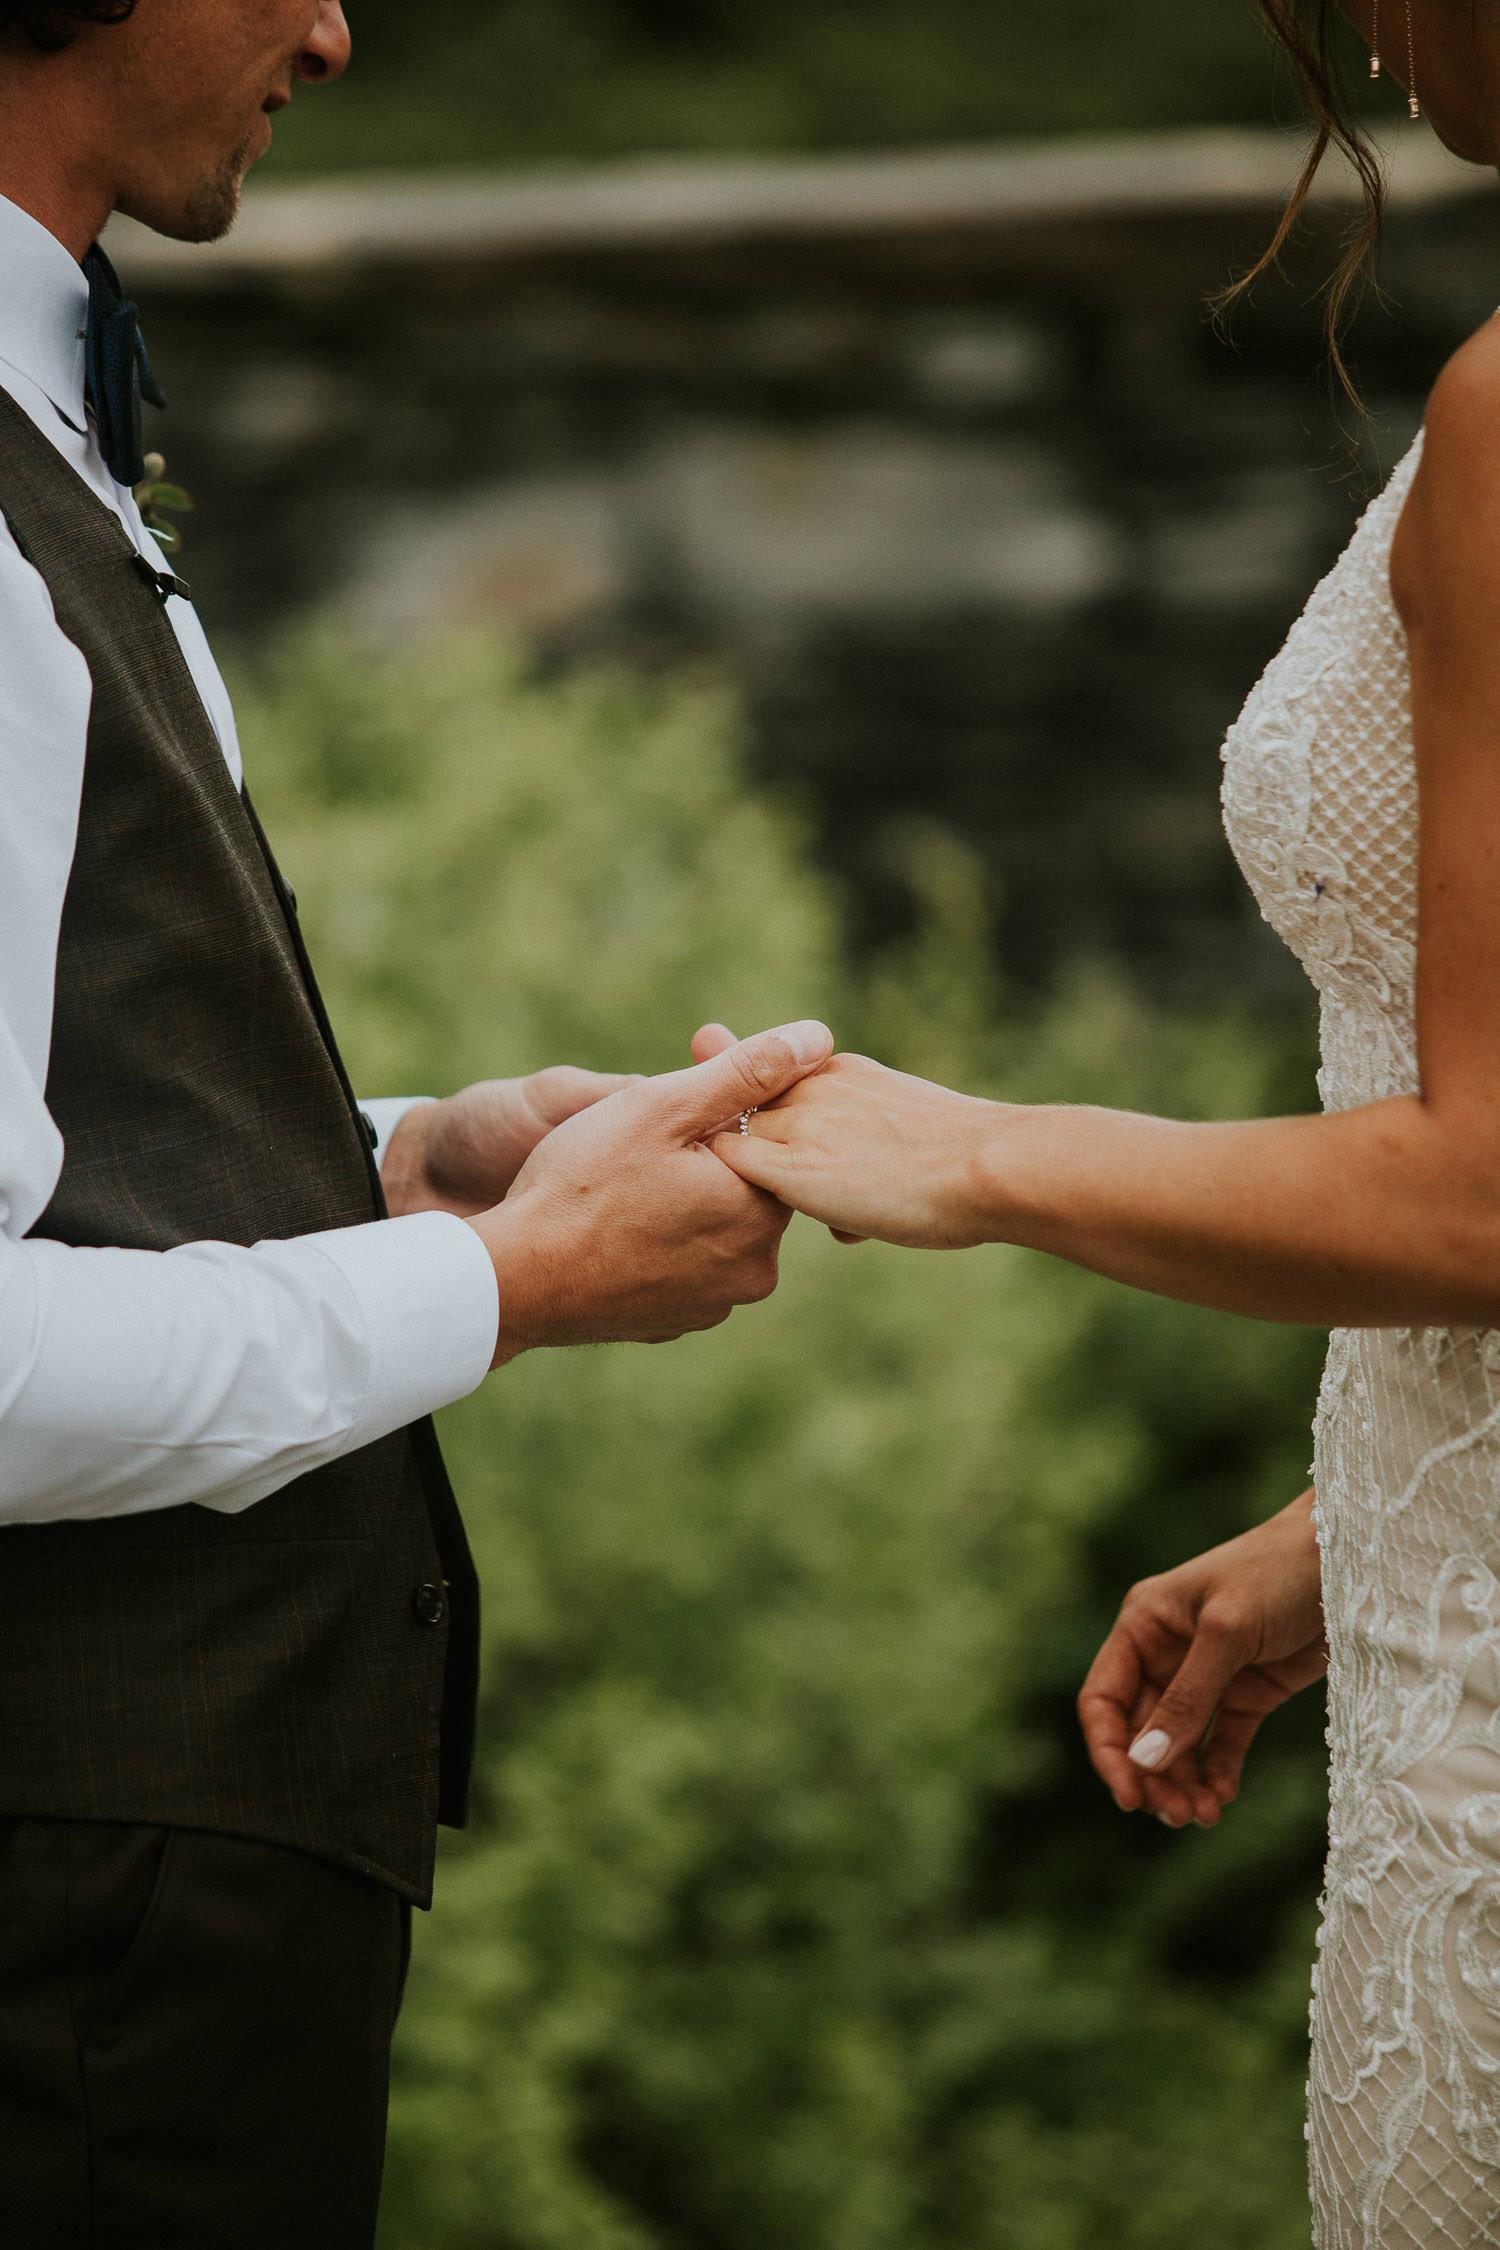 azuridge-estate-hotel-wedding-photographer-sarah-pukin-0159